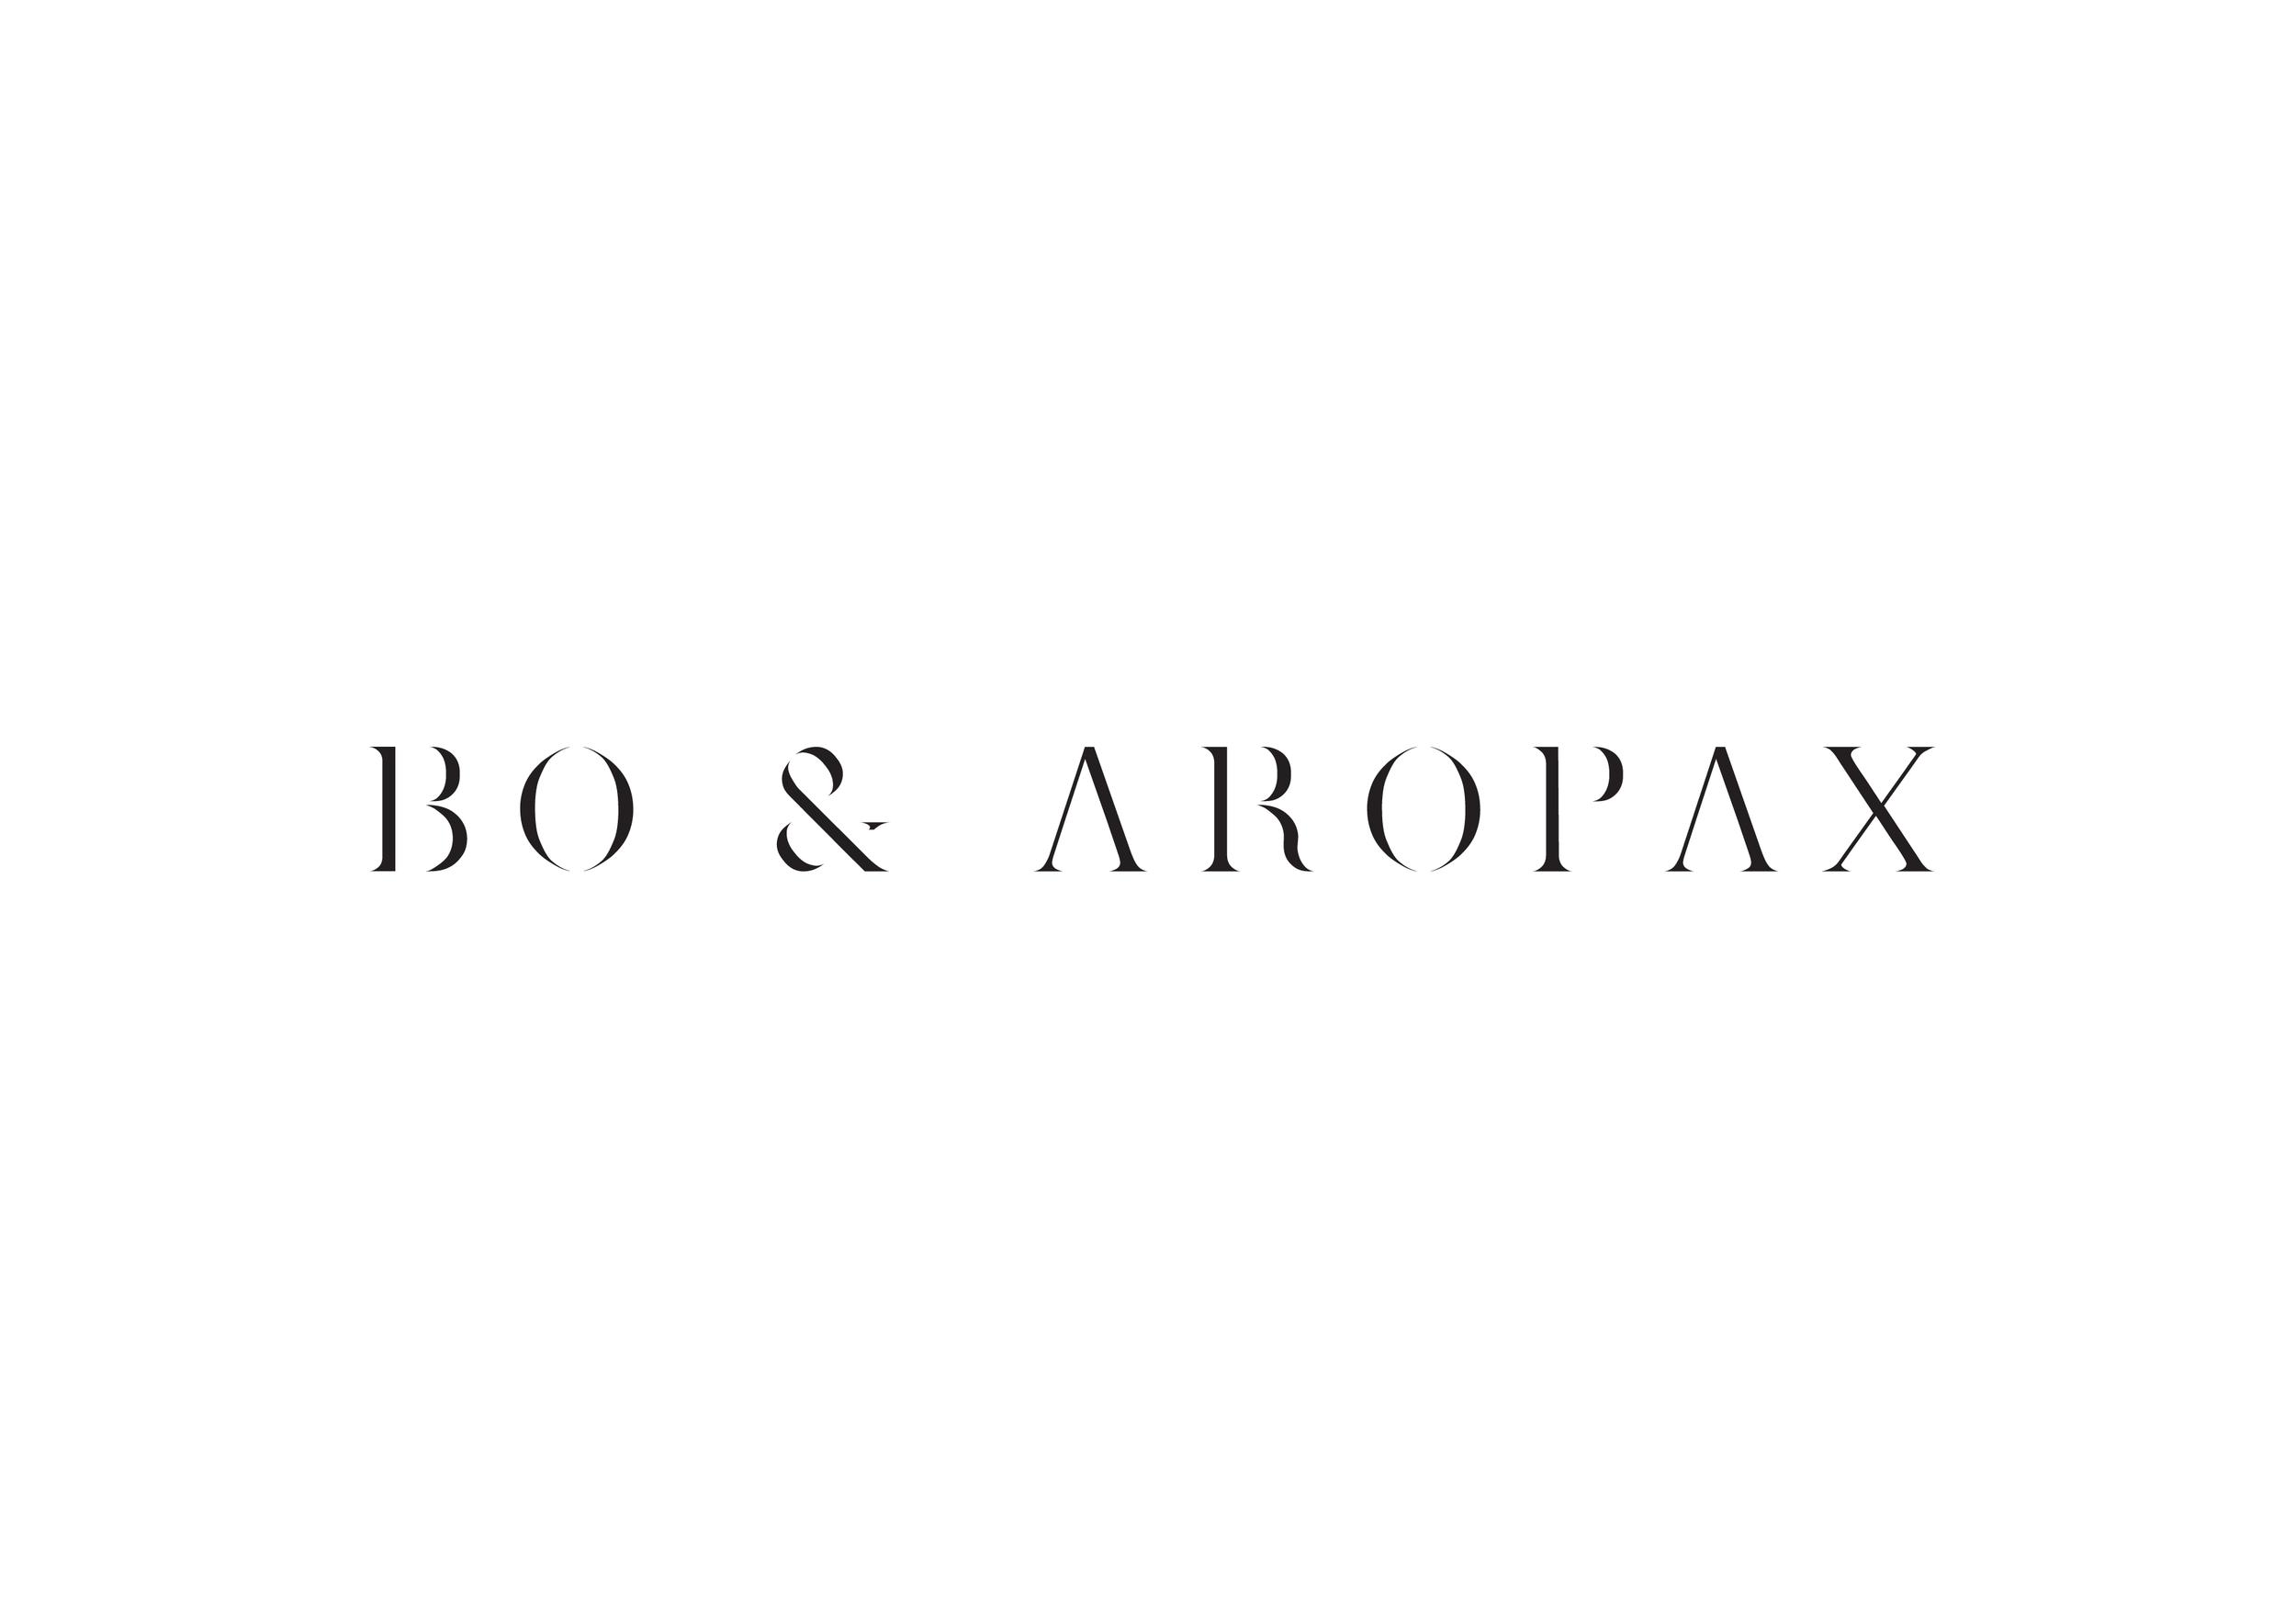 logo_web_positive.png